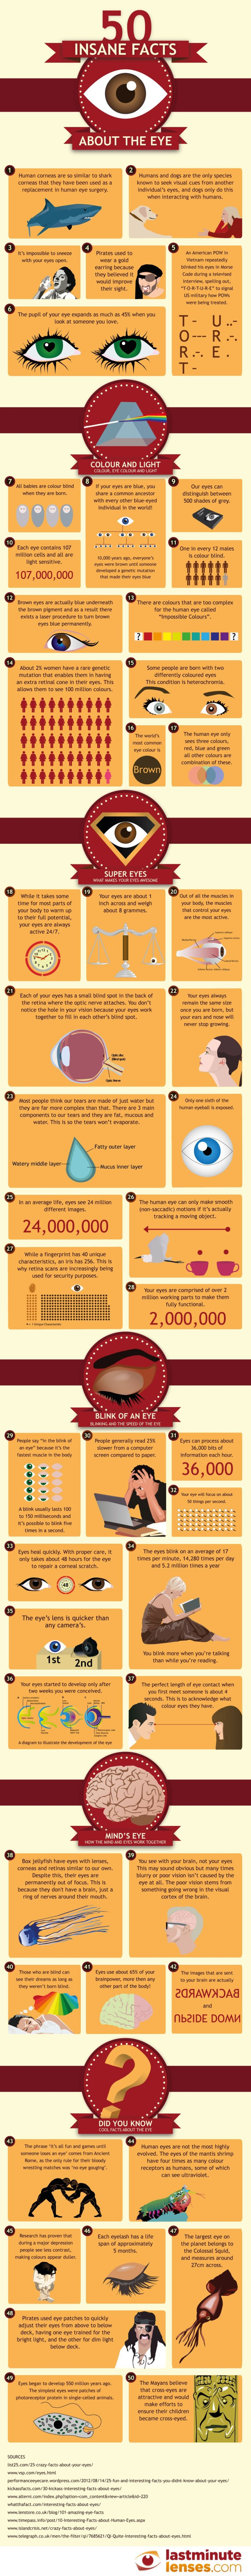 50 луди факти за очите